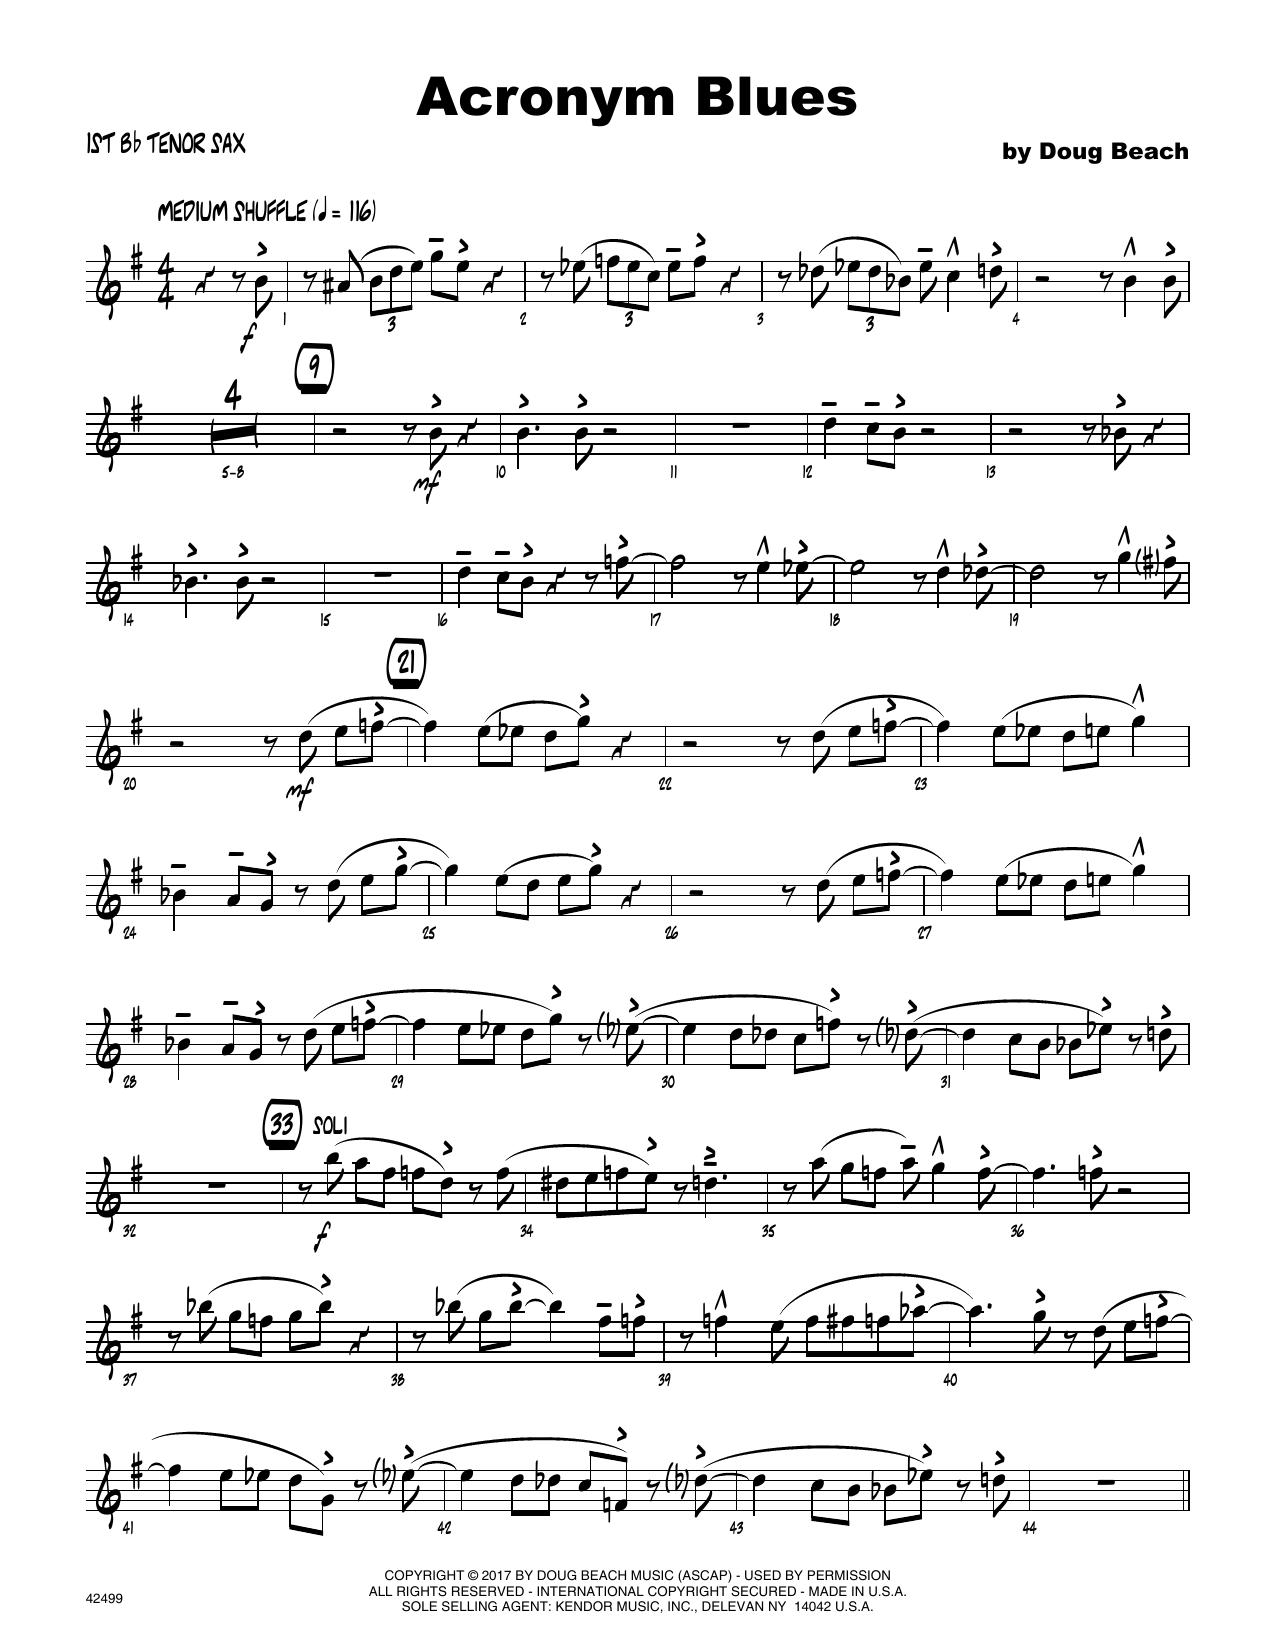 Acronym Blues - 1st Tenor Saxophone